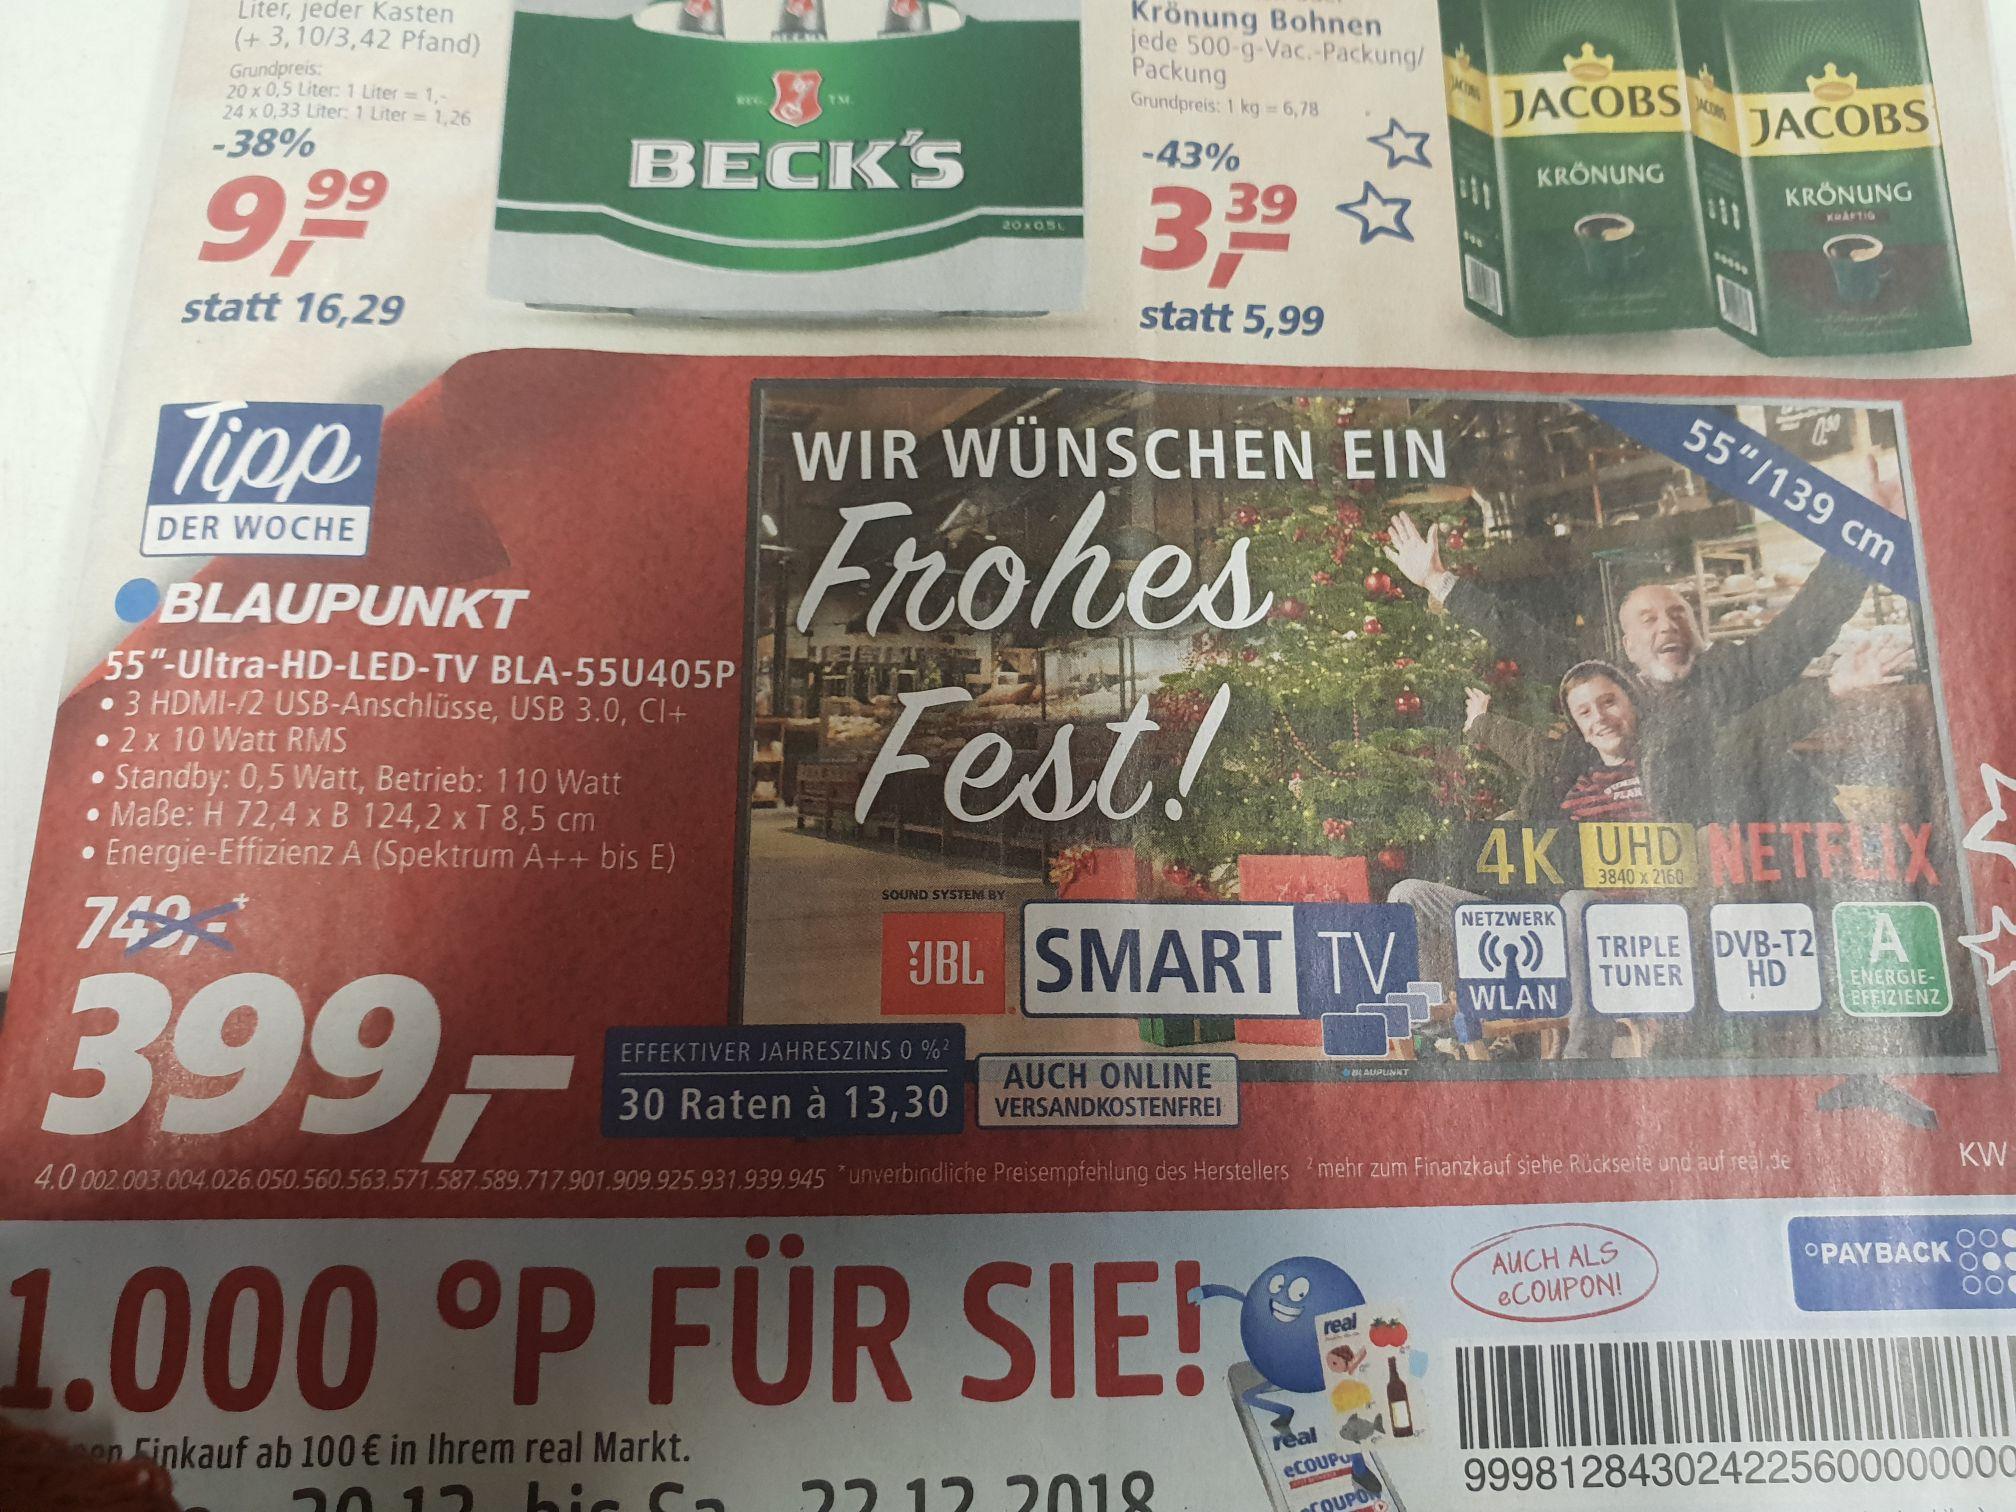 "Blaupunkt 55"" U-HD LED-TV für 399€ bei Real"